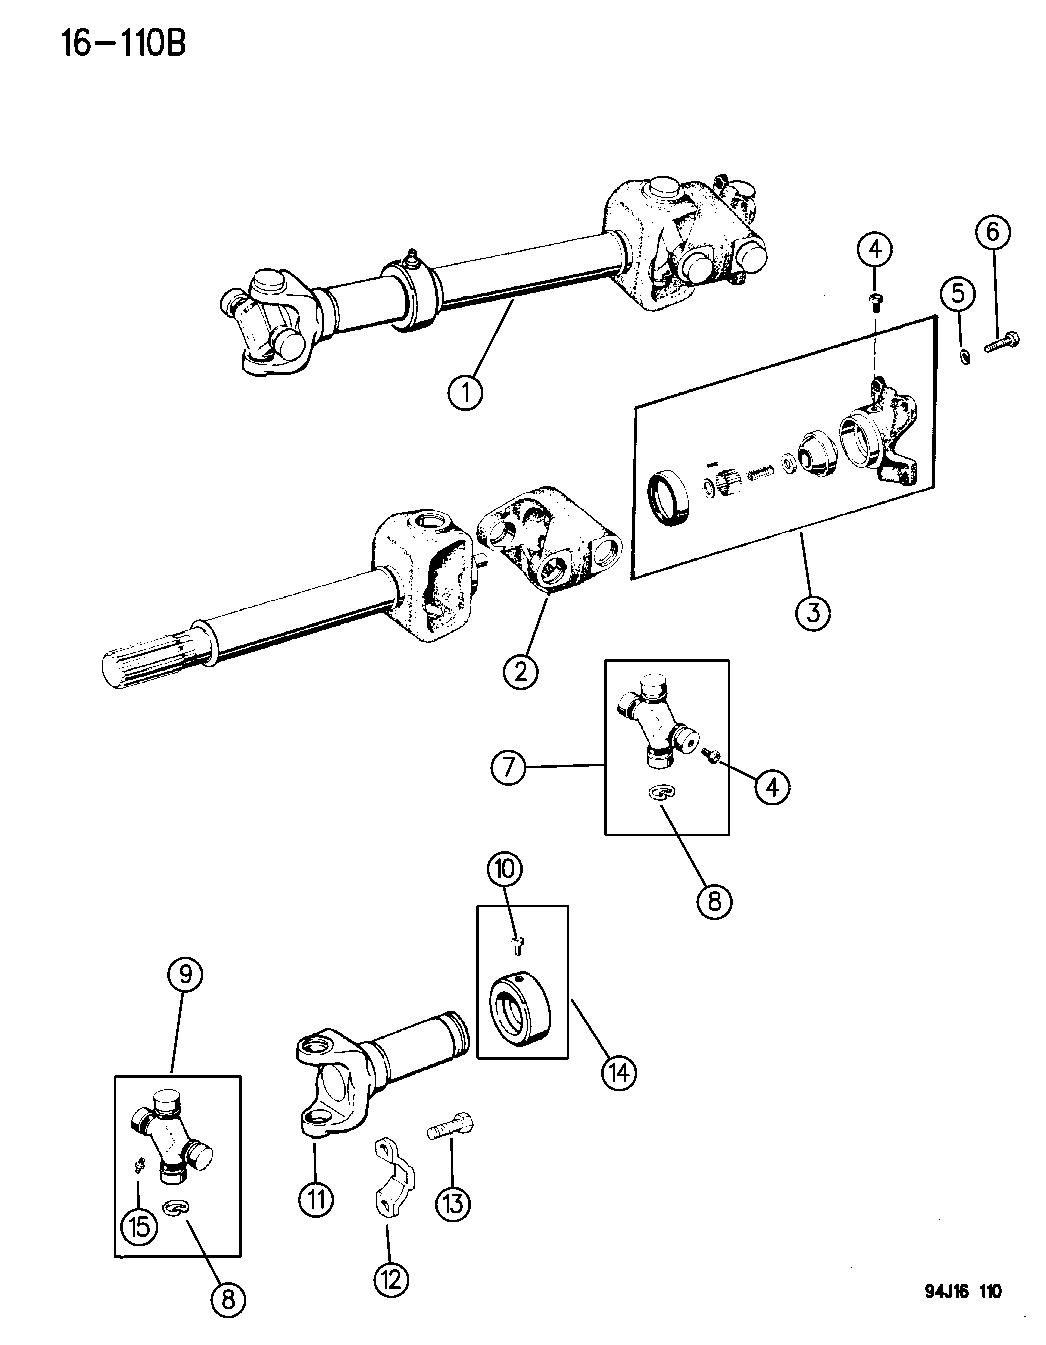 1995 Jeep Grand Cherokee Propeller Shaft & Universal Joint